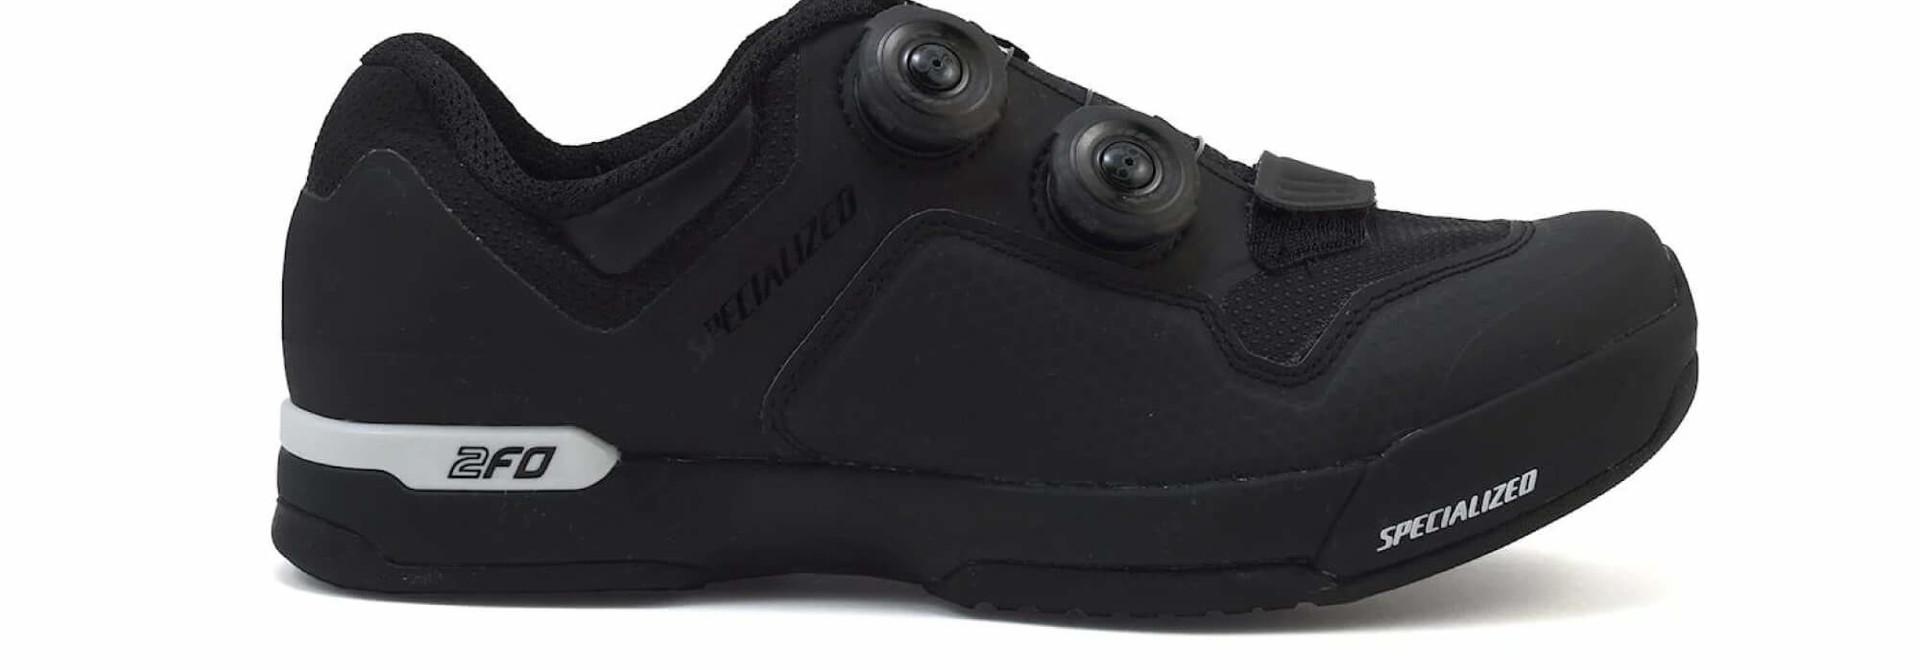 2FO Cliplite MTB Shoe 2019